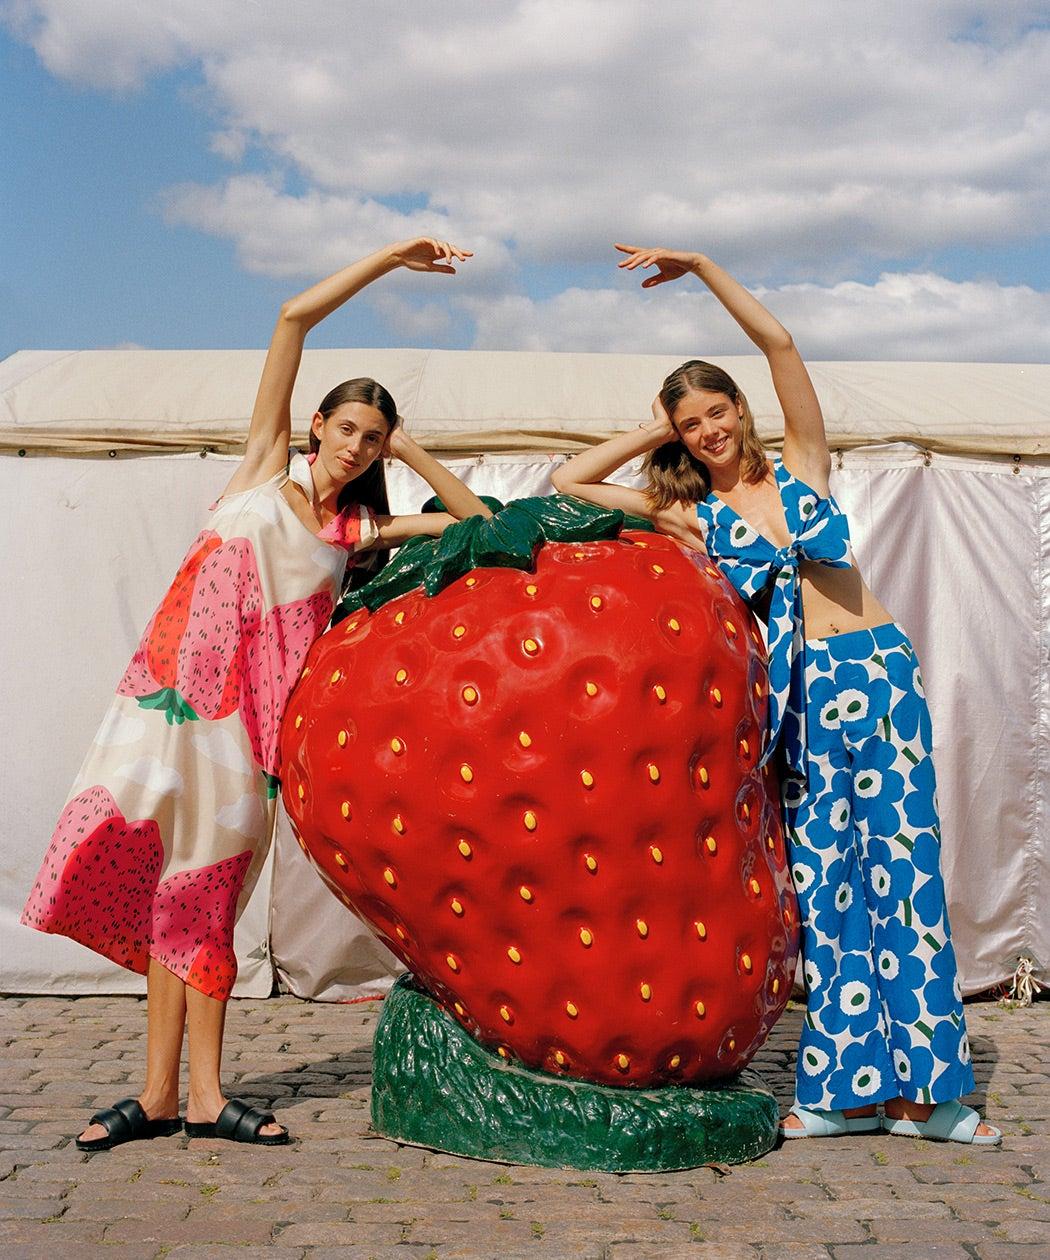 Marimekko clothing